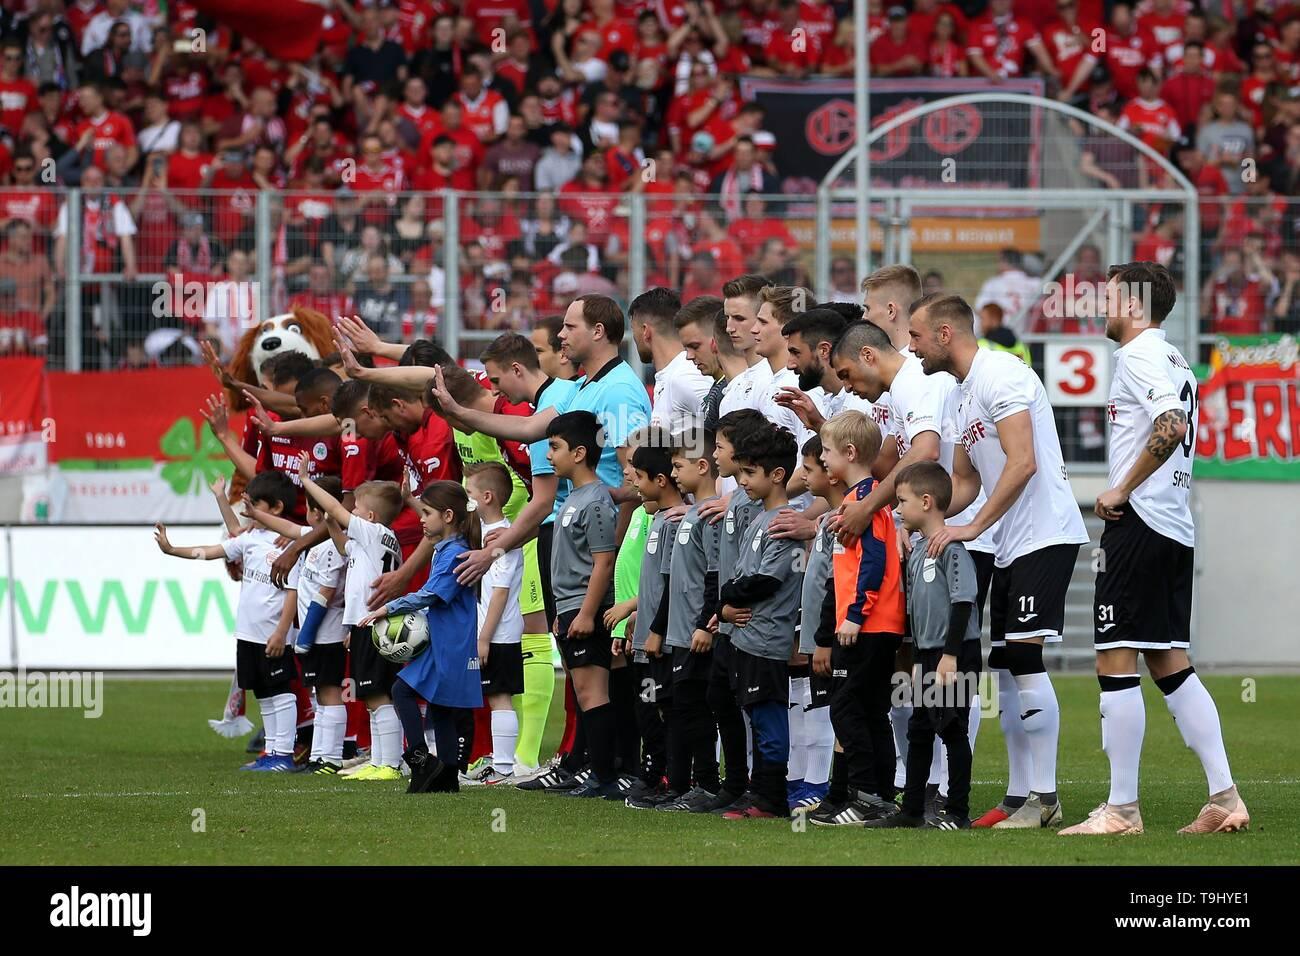 Oberhausen, Germany. 18th May, 2019. firo: 18.05.2019 Football, Regionalliga West, season 2018/2019 Rot-Weiss Oberhausen - SC Verl Line-up of both teams. | usage worldwide Credit: dpa/Alamy Live News - Stock Image